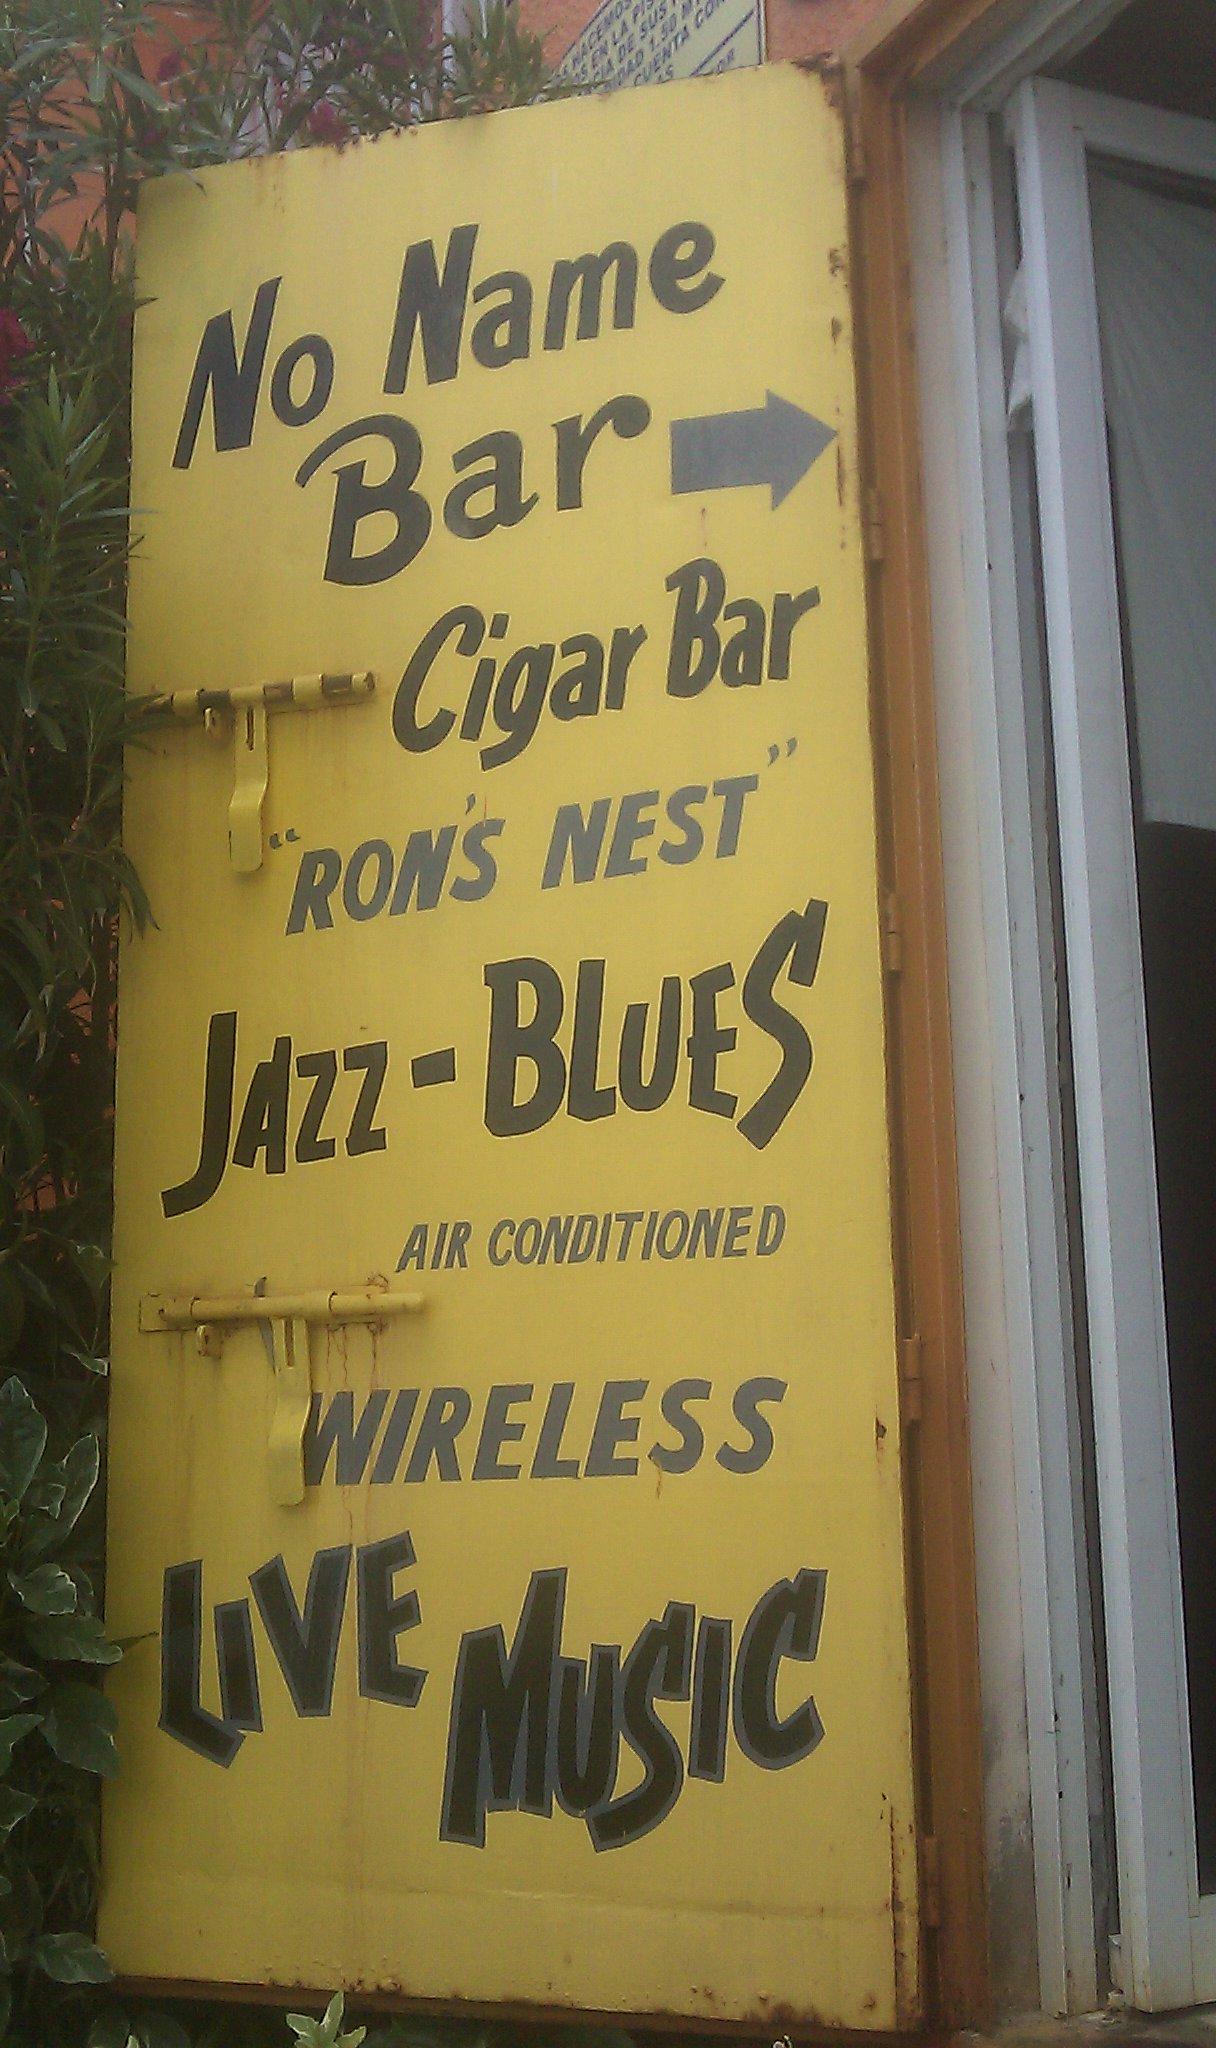 No Name Bar